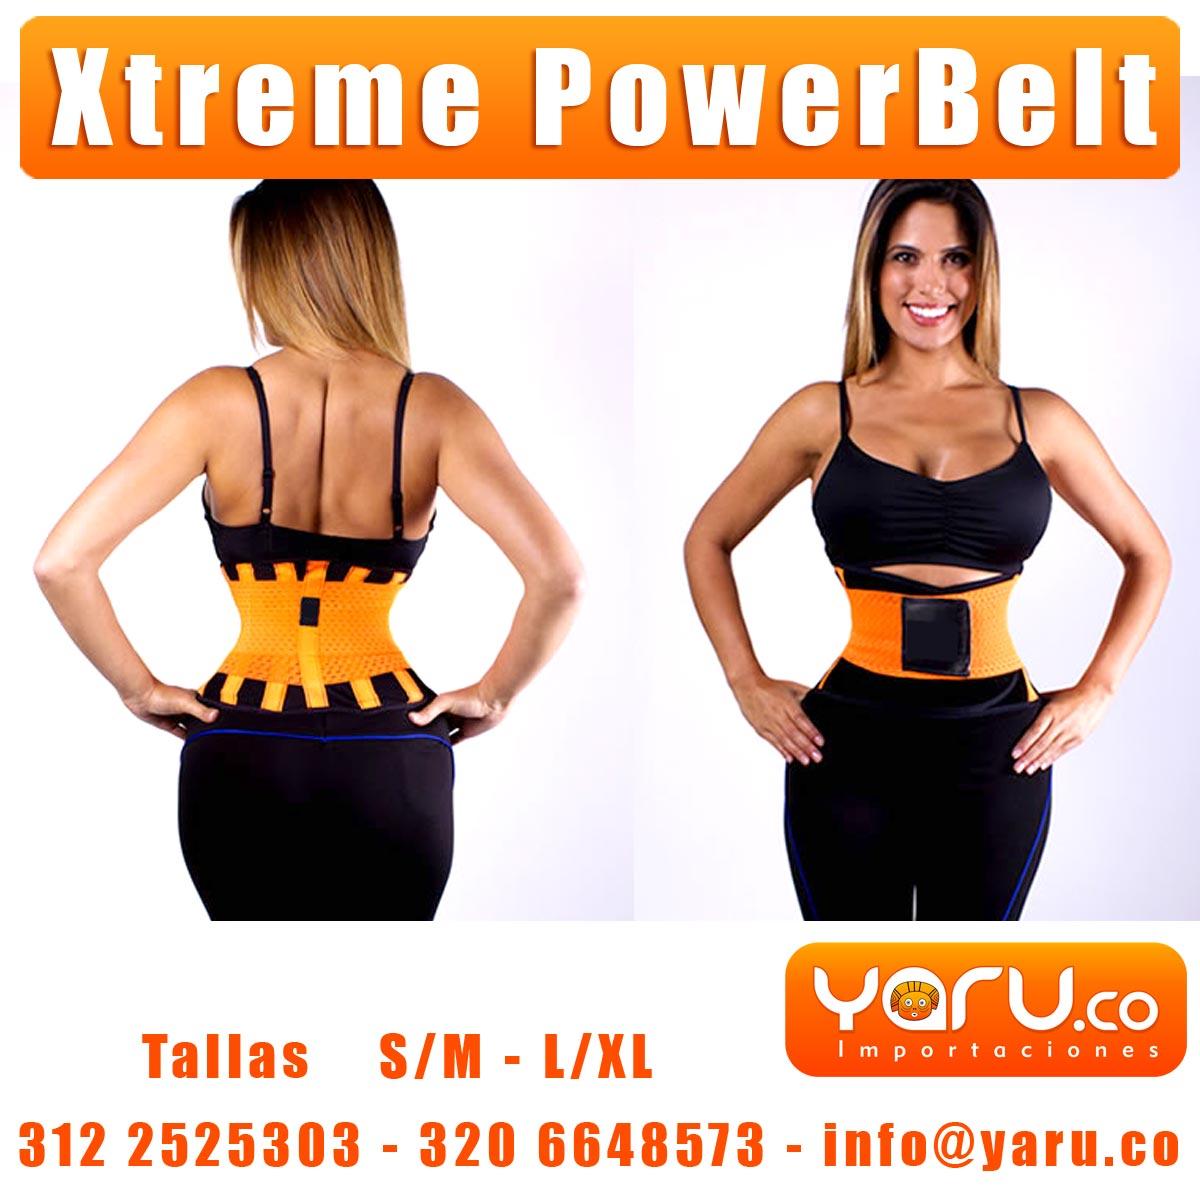 Faja Mujer Reductora para sudar chaleco pierde peso reduce cintura moldea figura